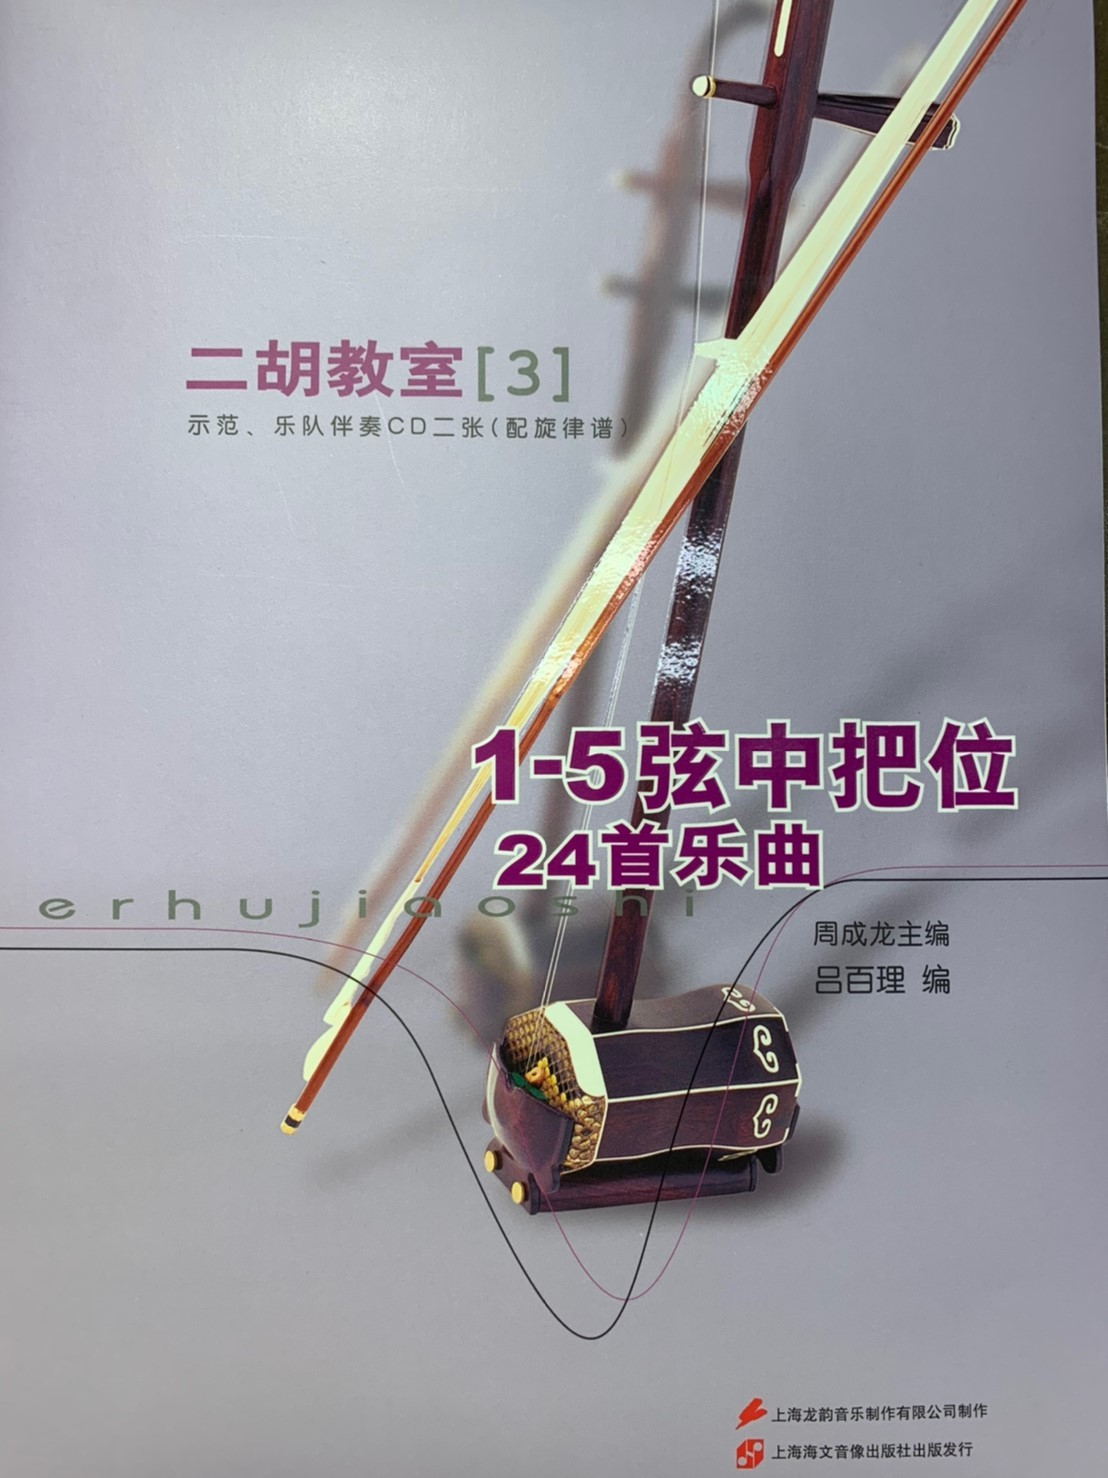 40317CD4-B094-4940-9ABB-A3B6680C33C3.jpeg